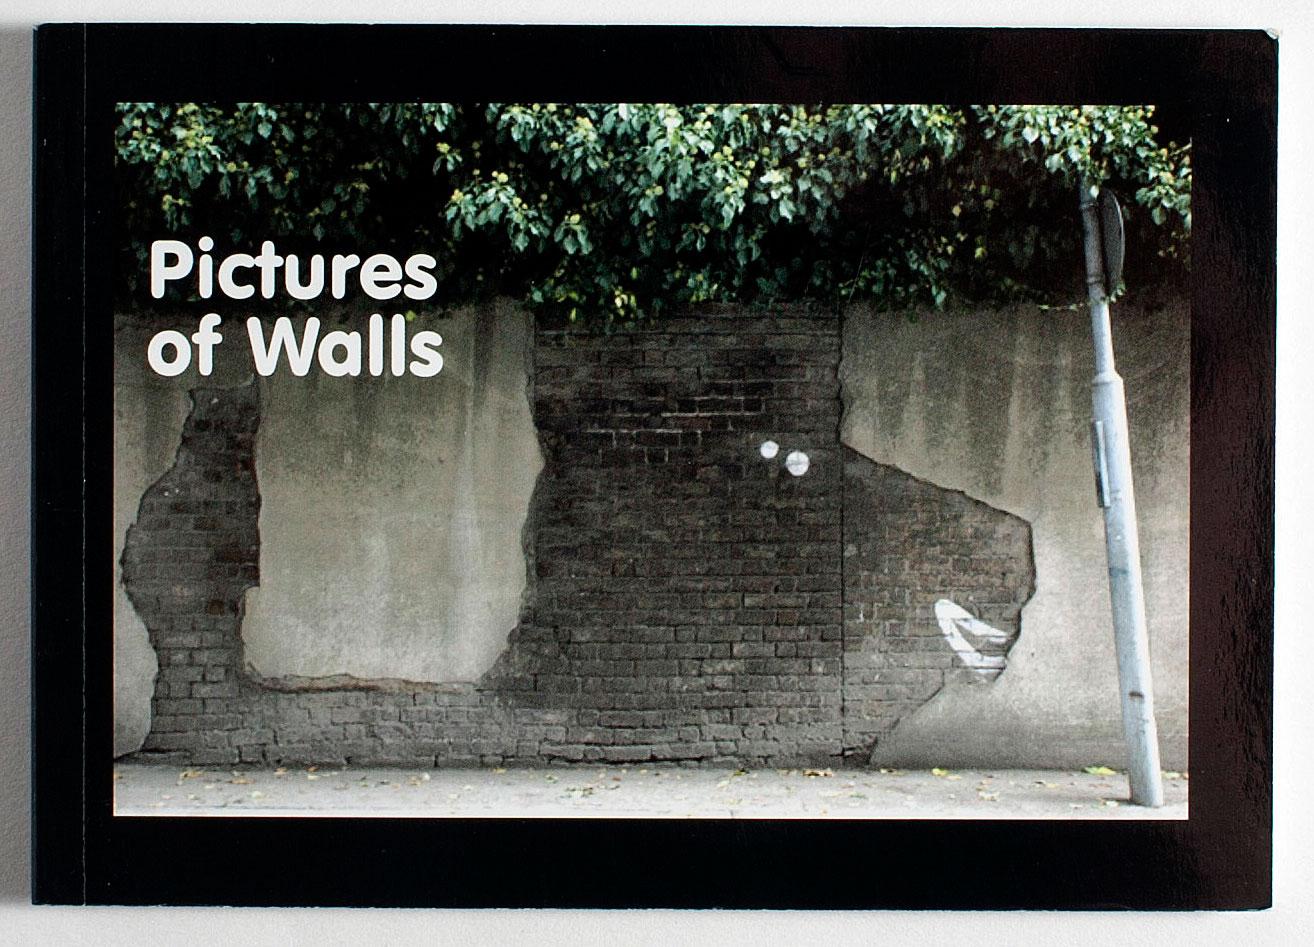 epm-print-management-bristol-art-books-pictures-on-walls-2.jpg